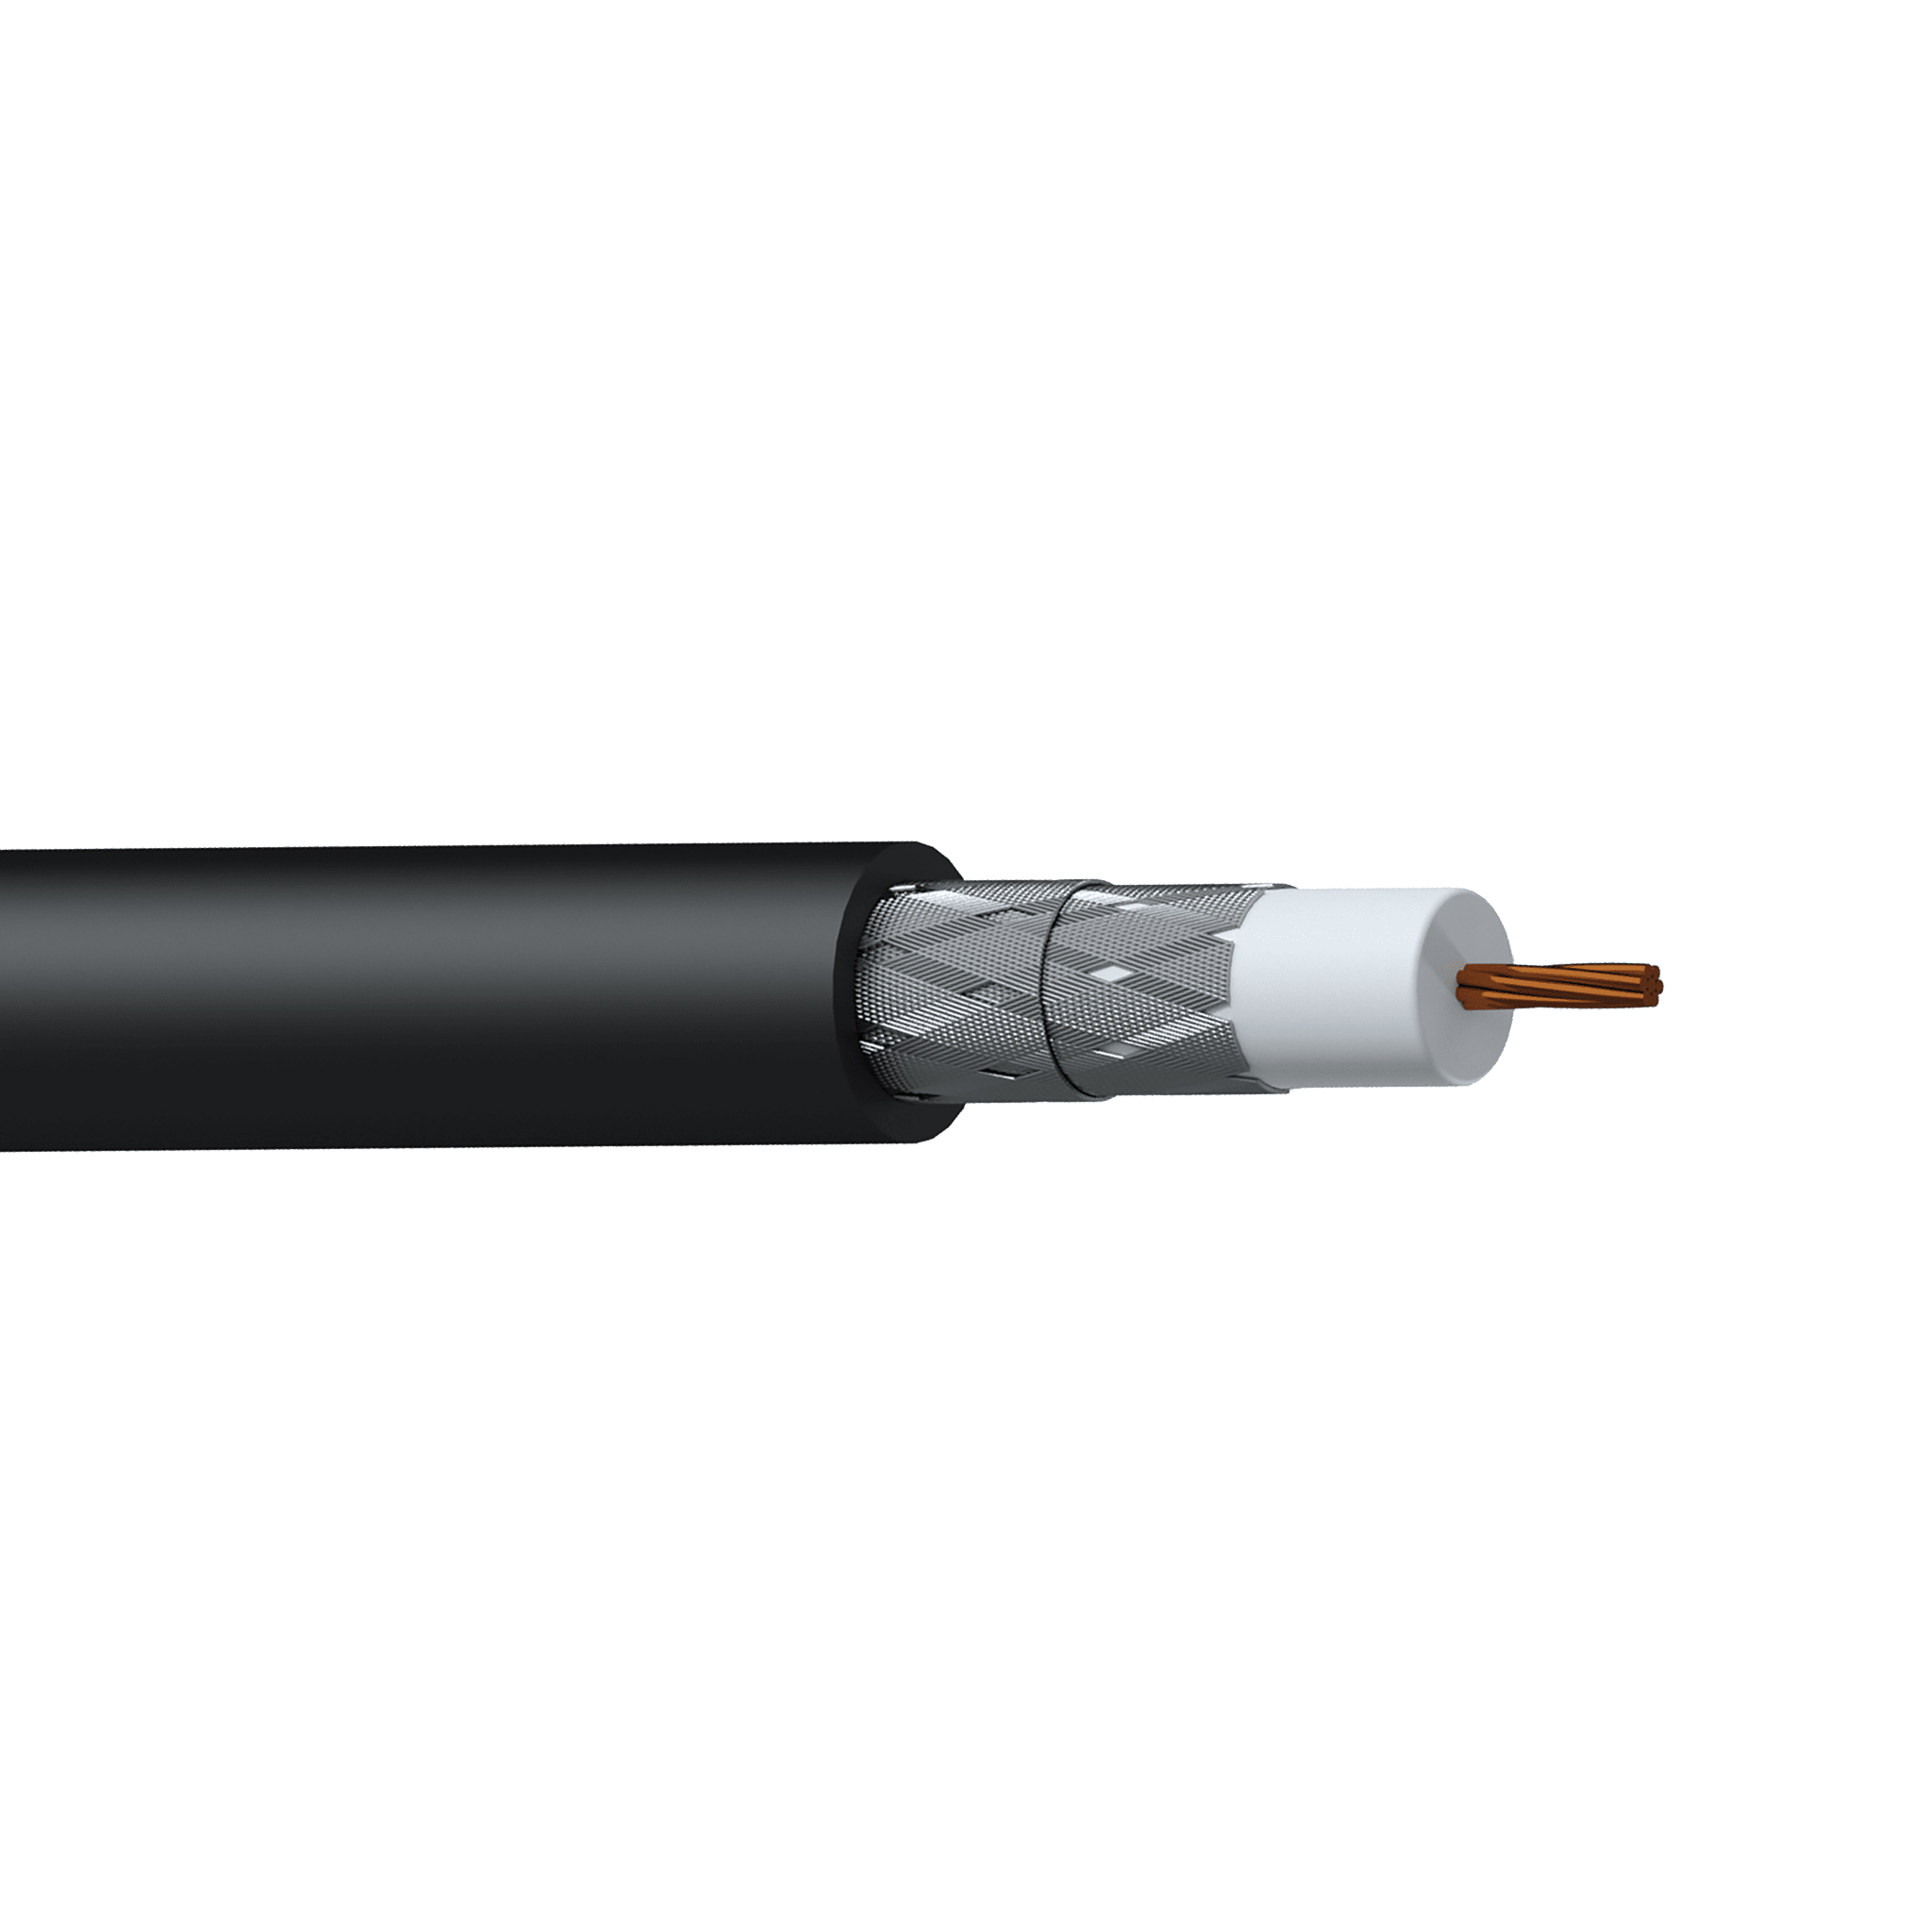 PCX160 - Coax video cable - RG6/U - flex 0.65 mm² - 19 AWG - HighFlex™